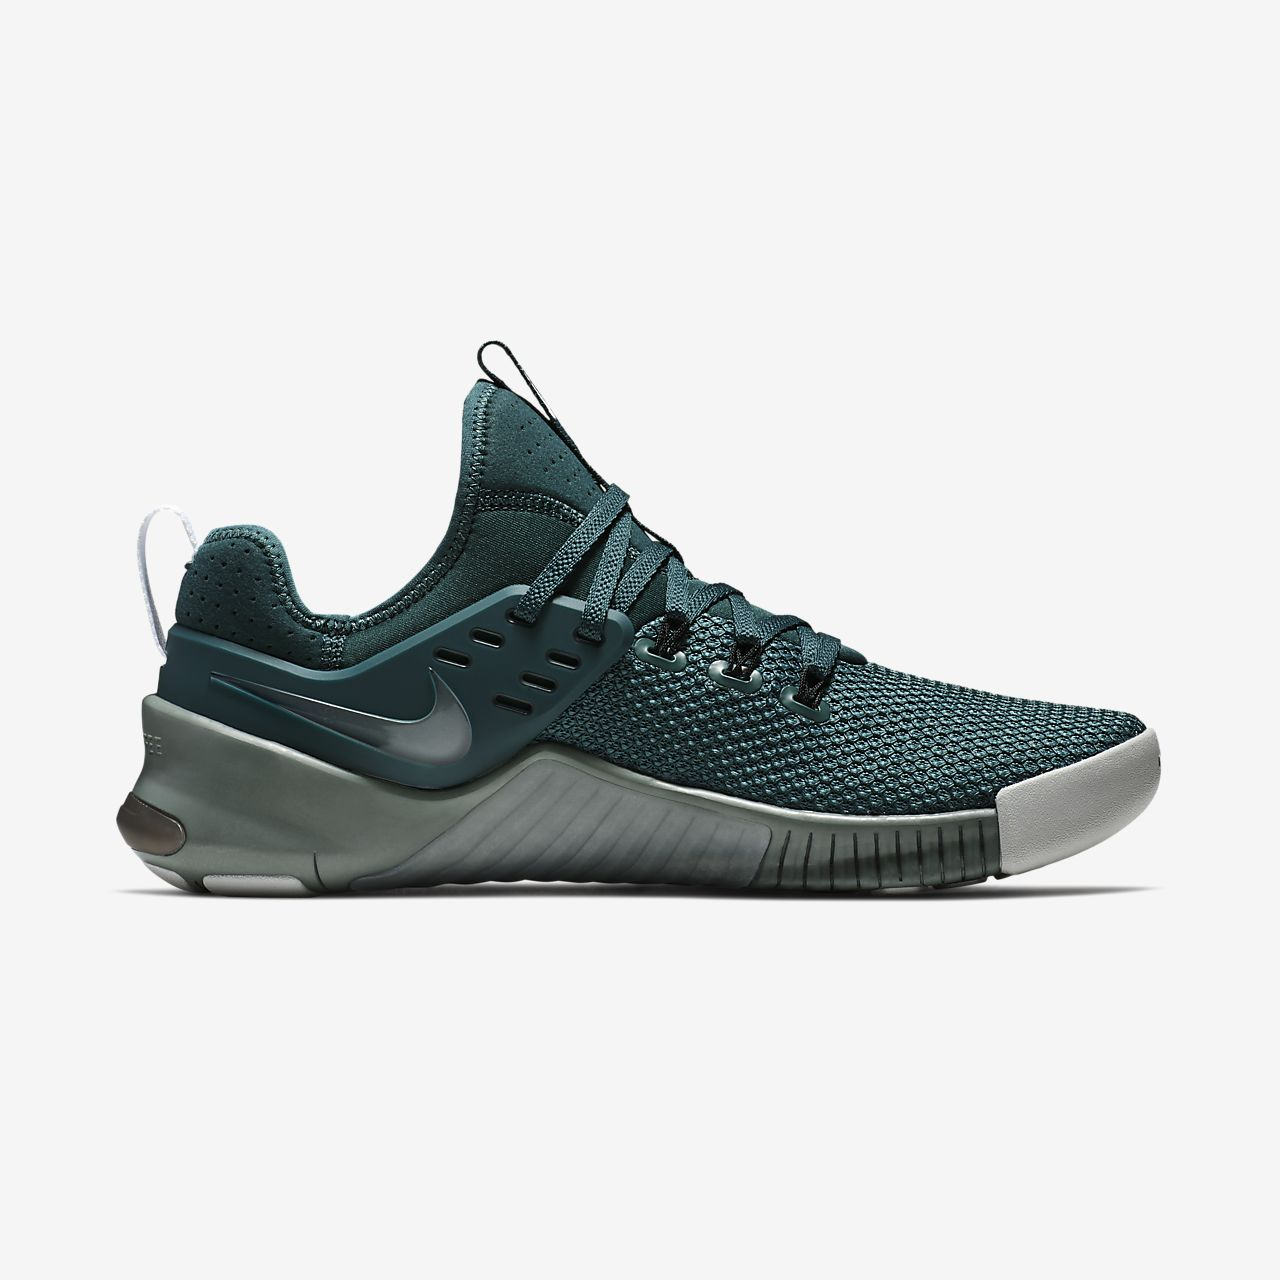 Nike PerformanceFREE METCON - Trainers - dark stucco/olive/light silver/medium brown jrabhB8jb